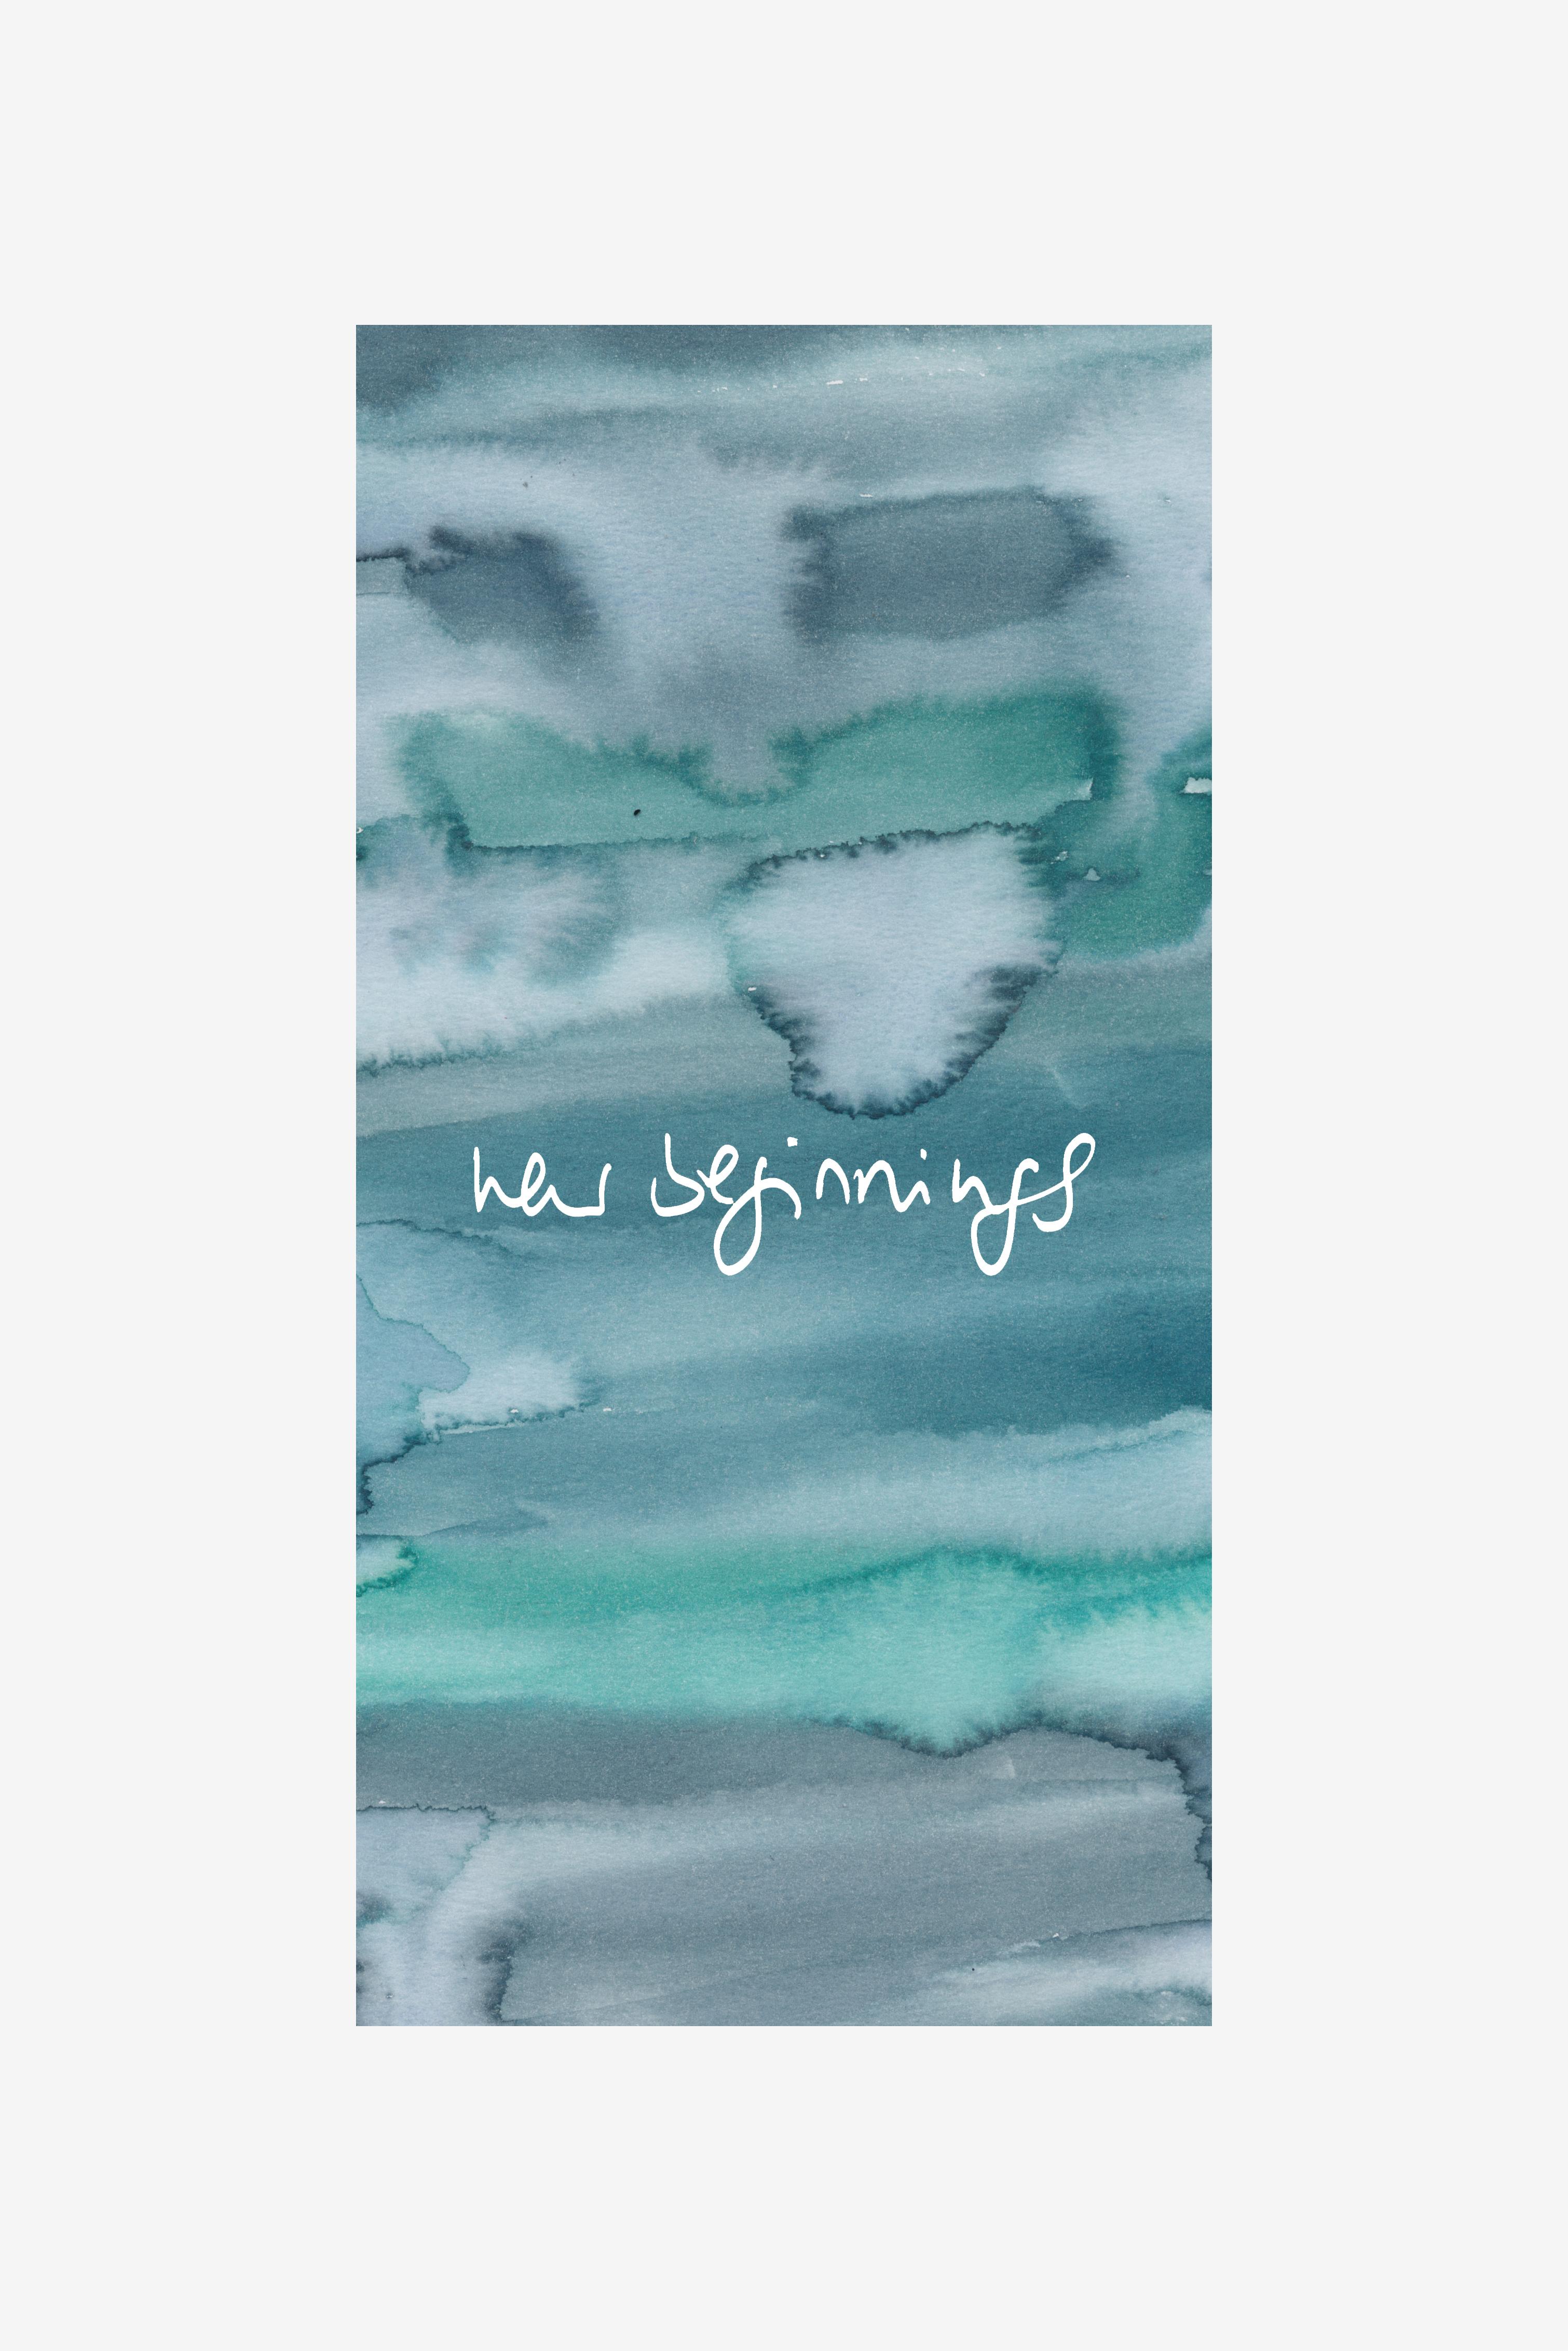 nadine bieg watercolor lettering new beginnings